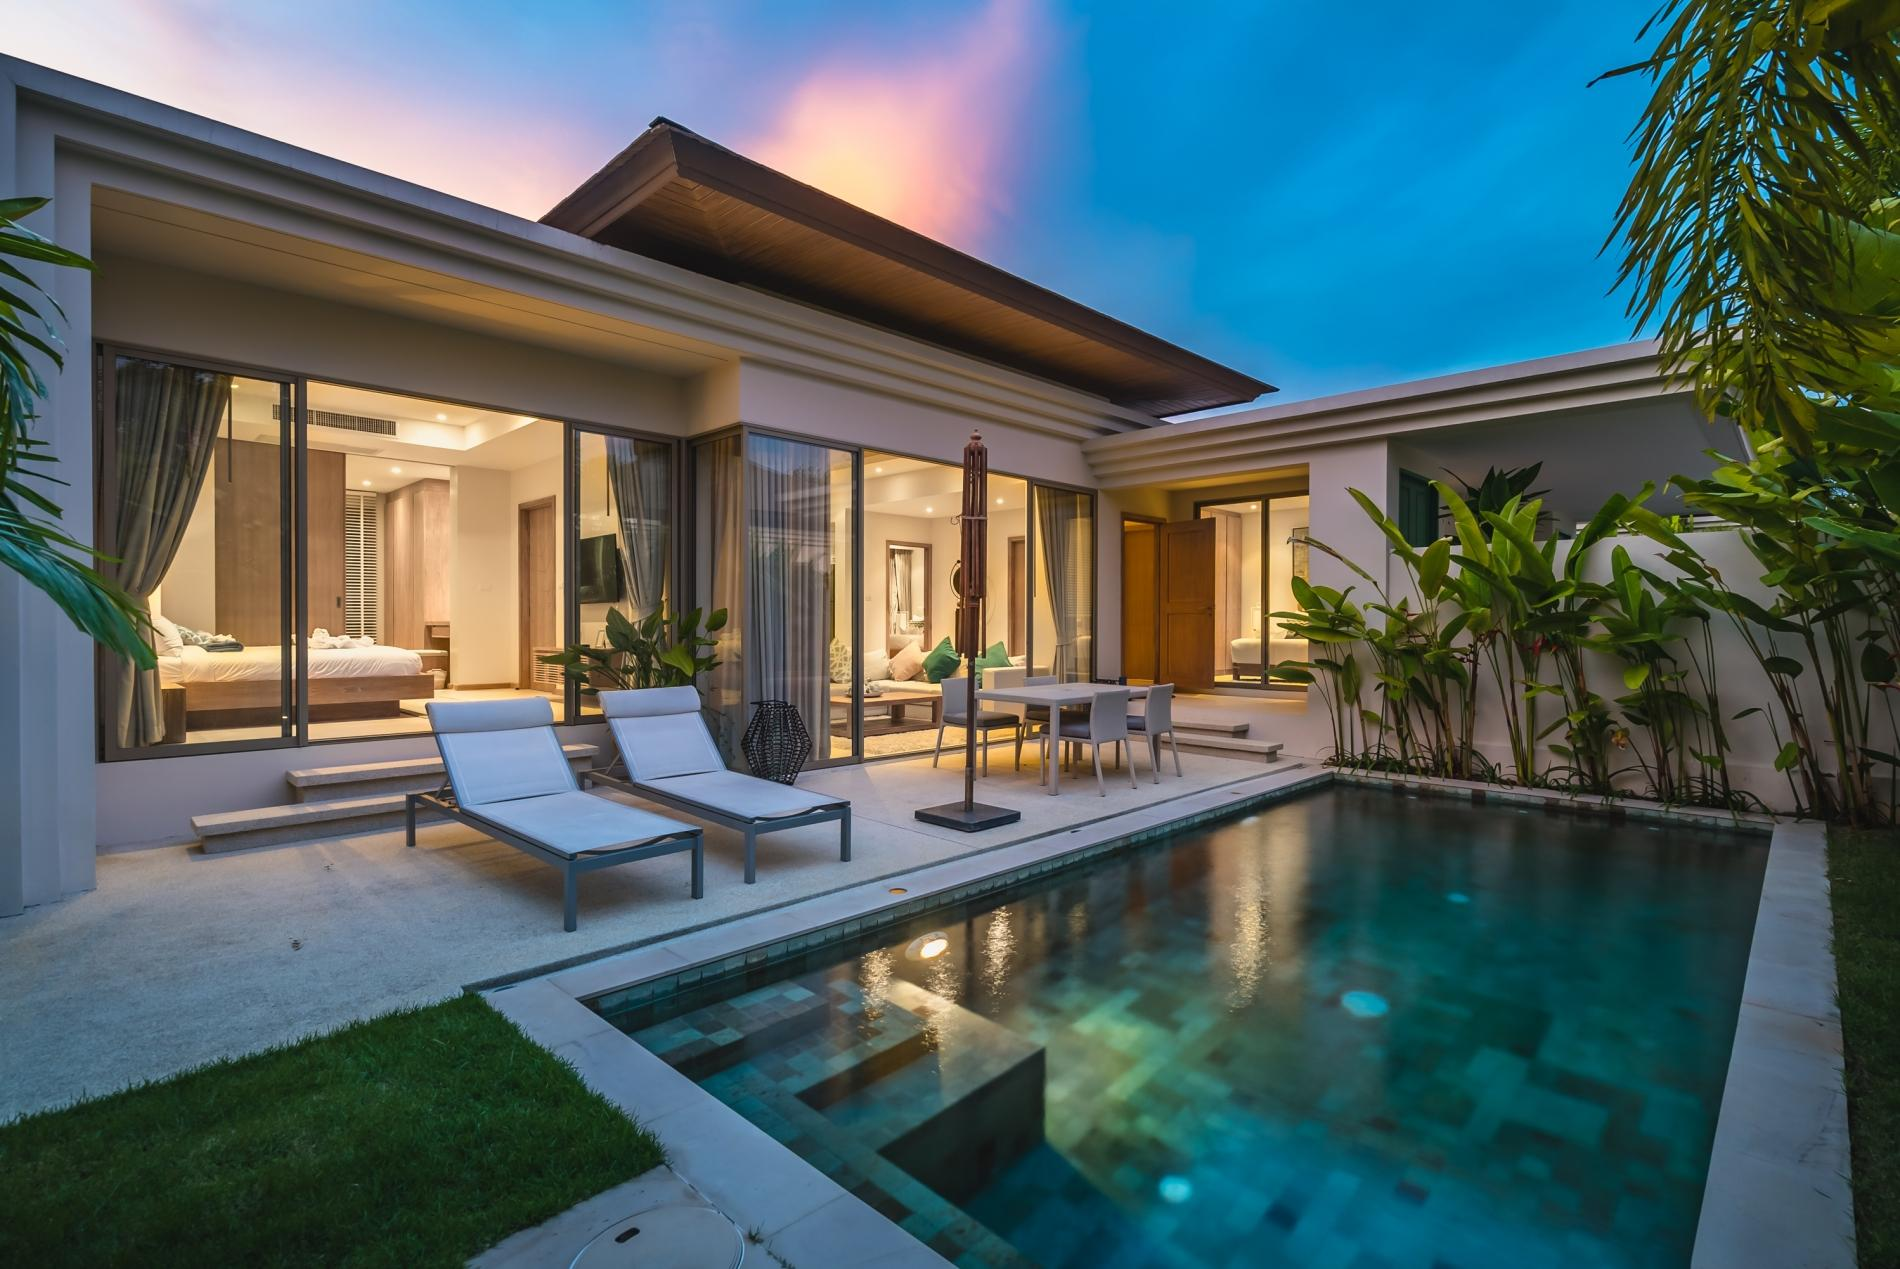 Apartment Trichada 18 - Private pool modern 3 bedroom villa photo 18344797